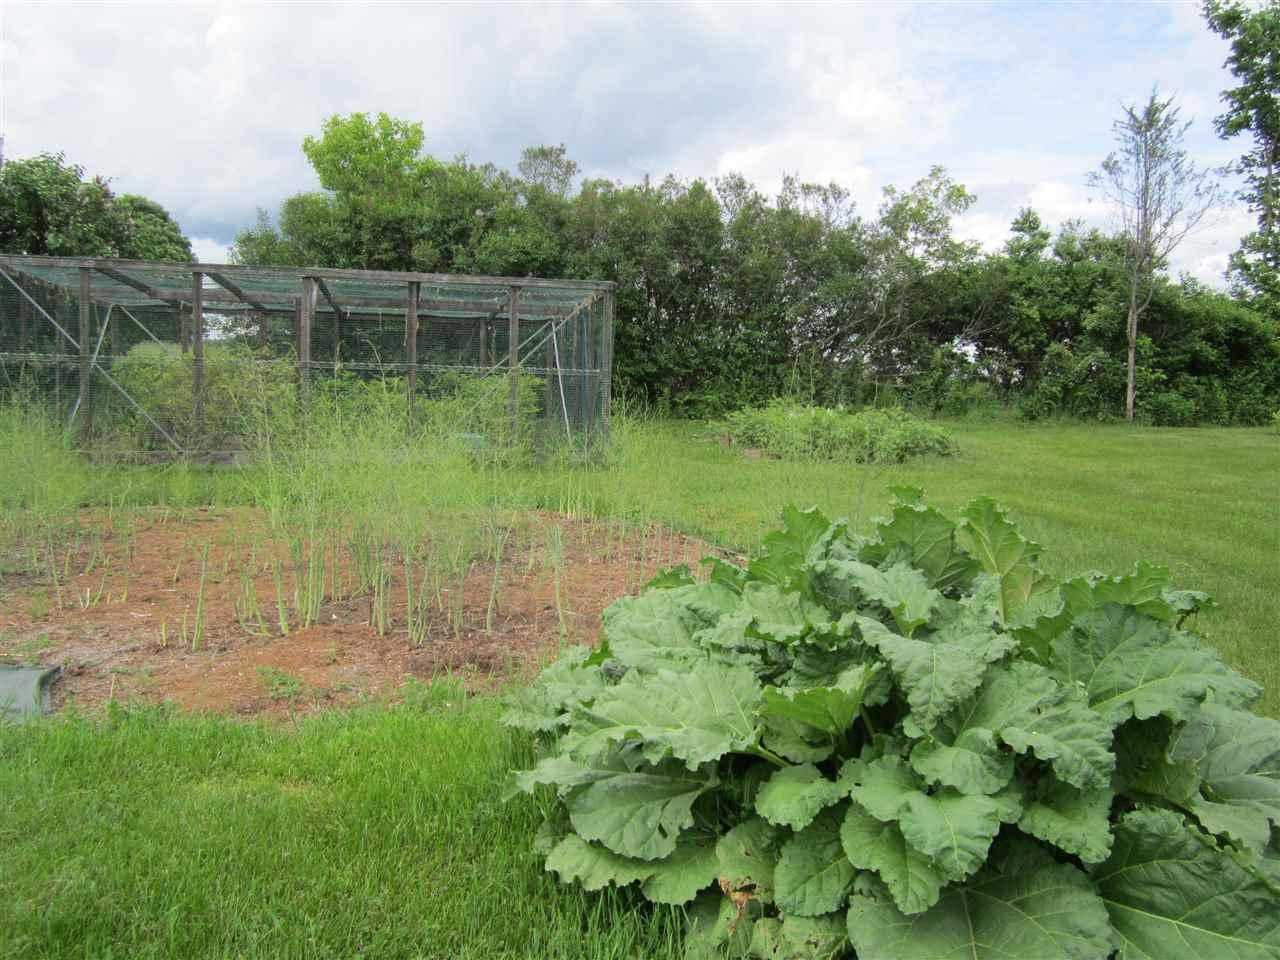 Rhubard, Asparagus, Blueberries